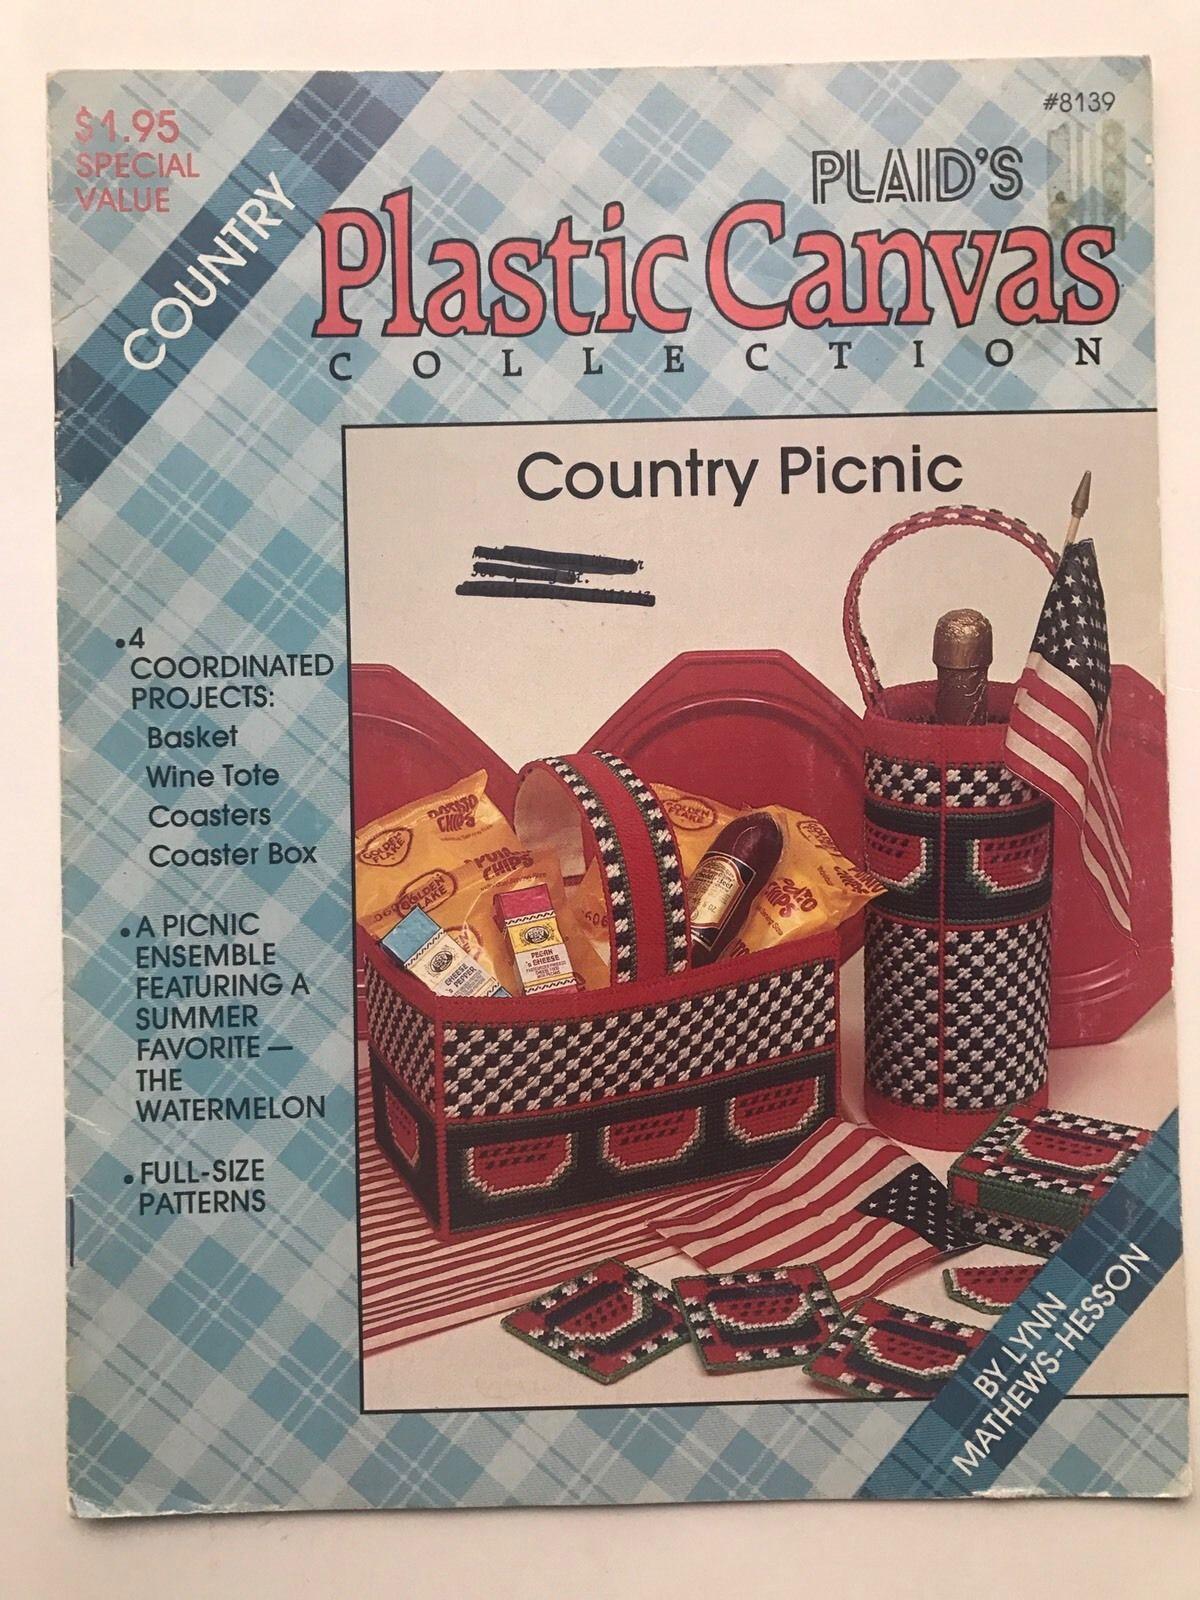 Vintage Plastic Canvas Leaflet 8139 Country Picnic Watermelon Print Plaid's Coll - $4.97